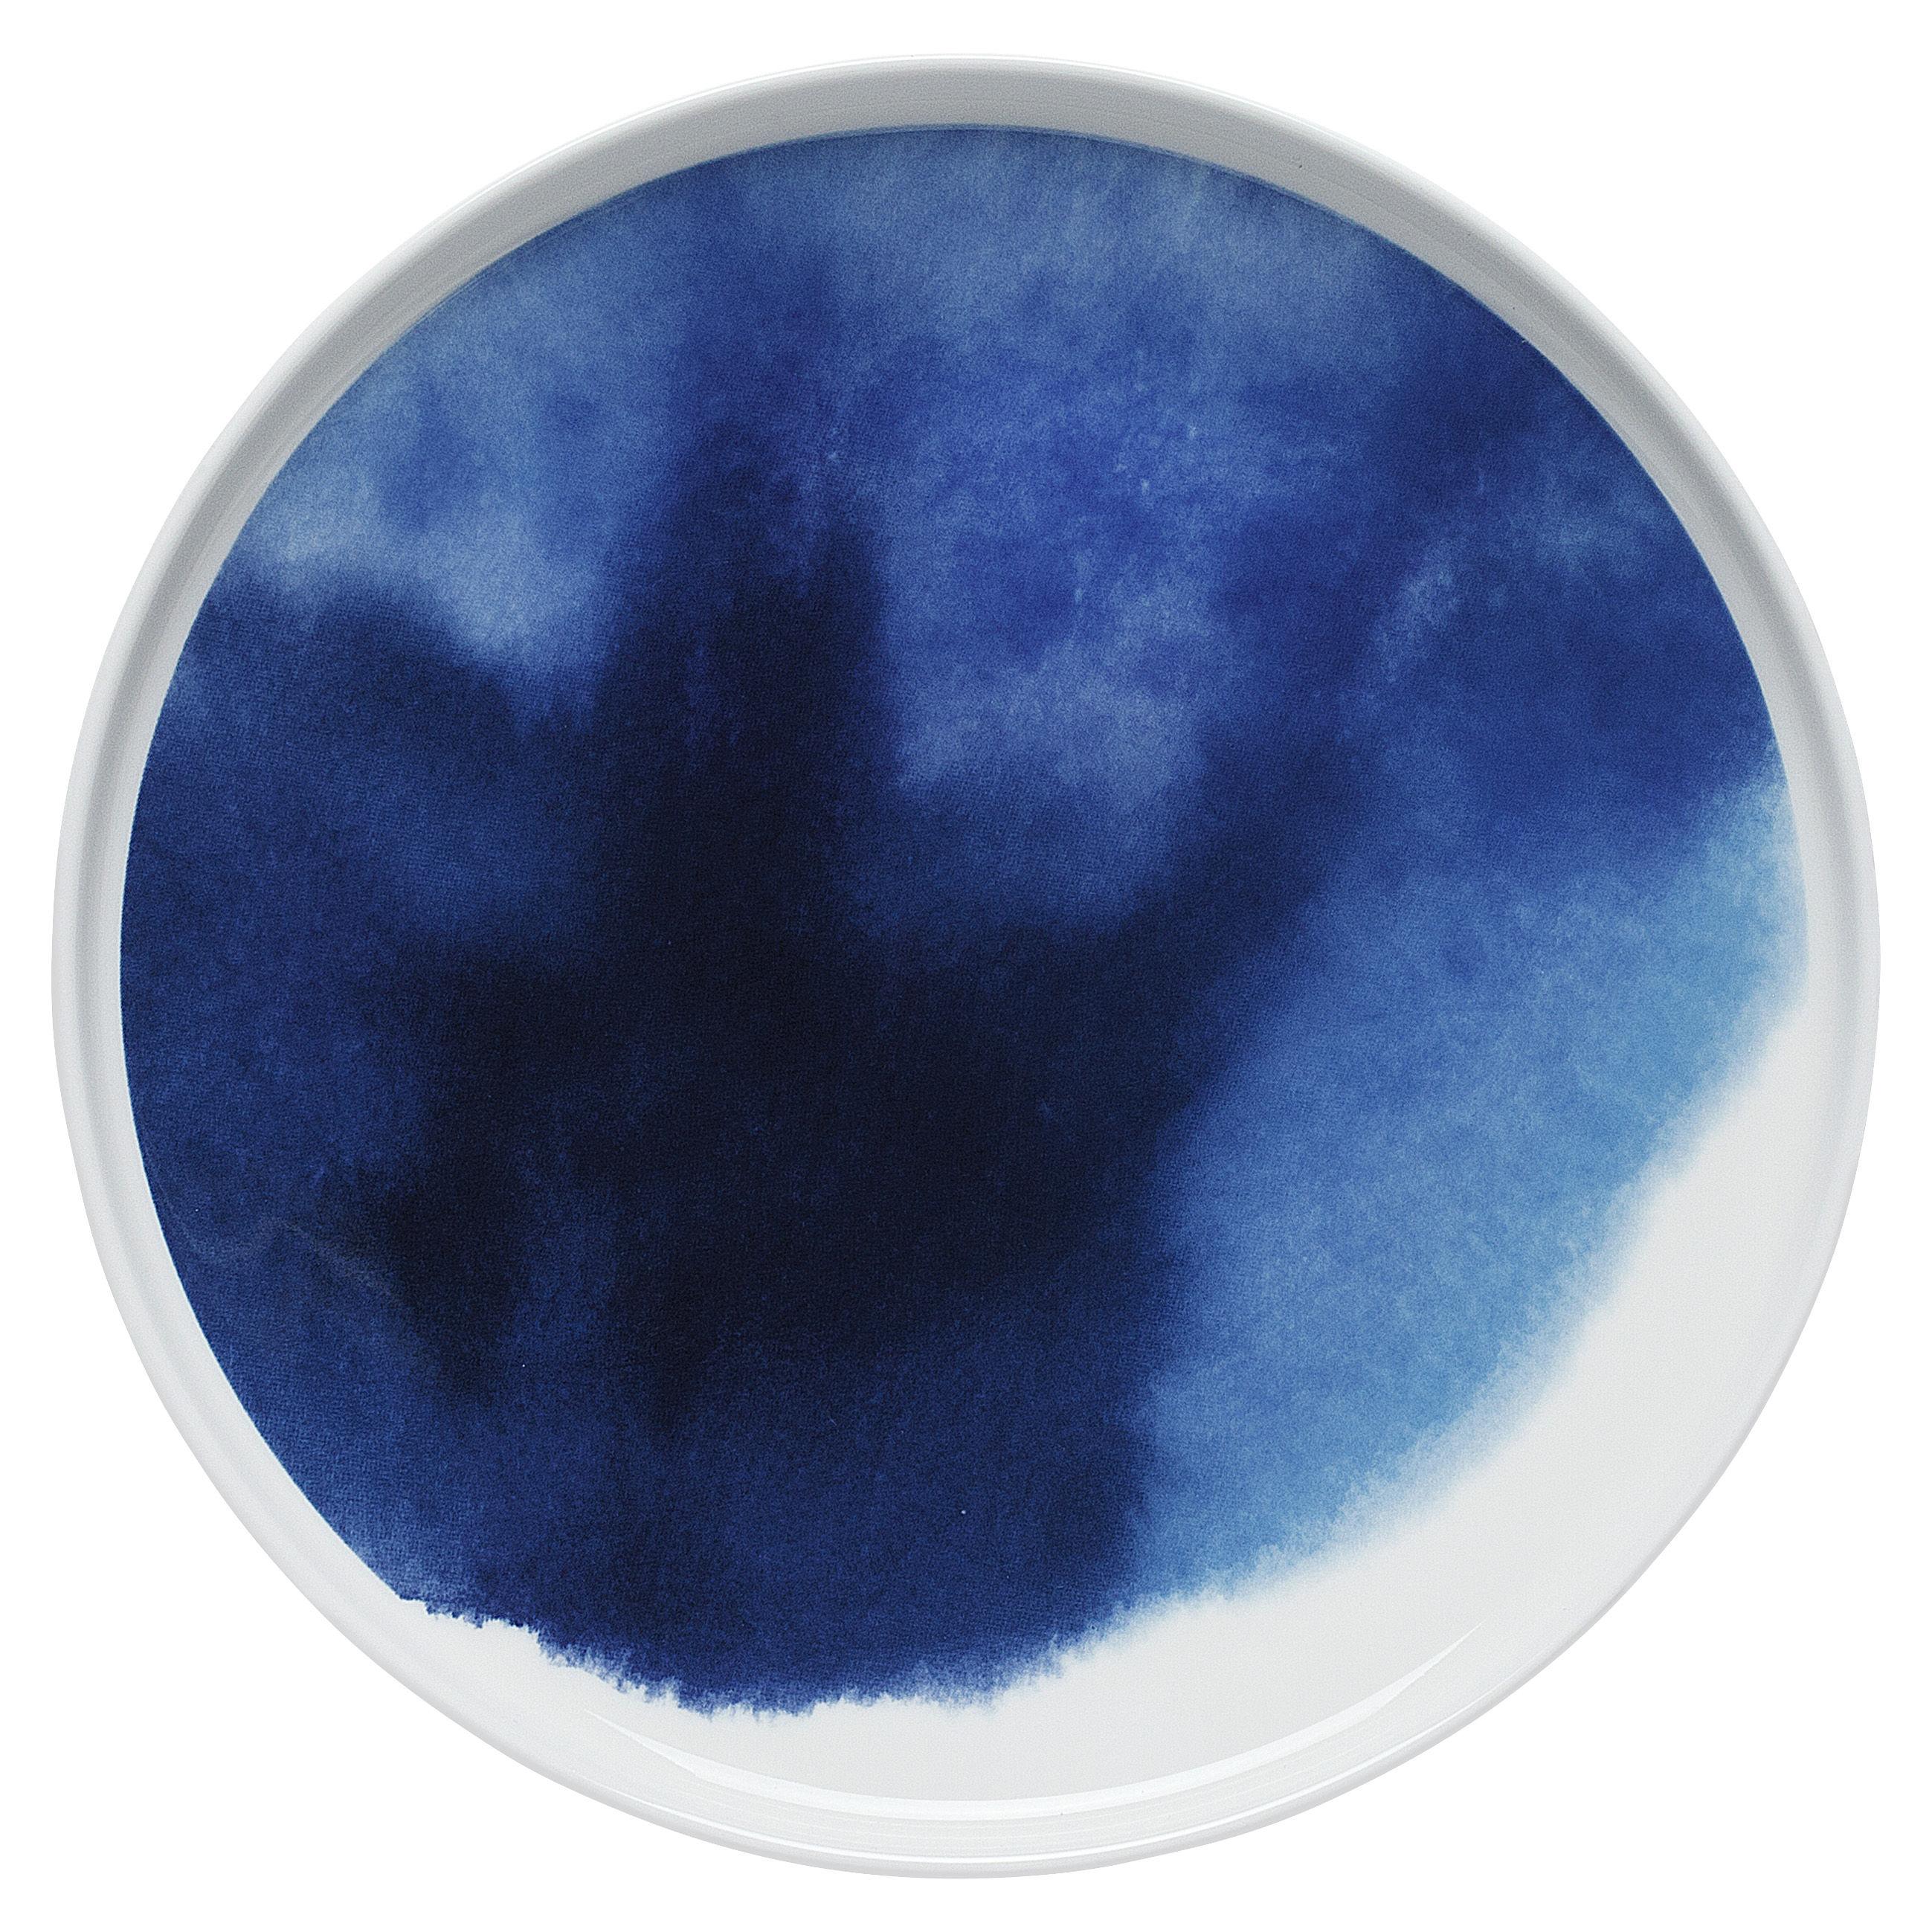 Arts de la table - Assiettes - Assiette Oiva Sääpäiväkirja / Ø 25 cm - Marimekko - Sääpäiväkirja / Bleu - Porcelaine